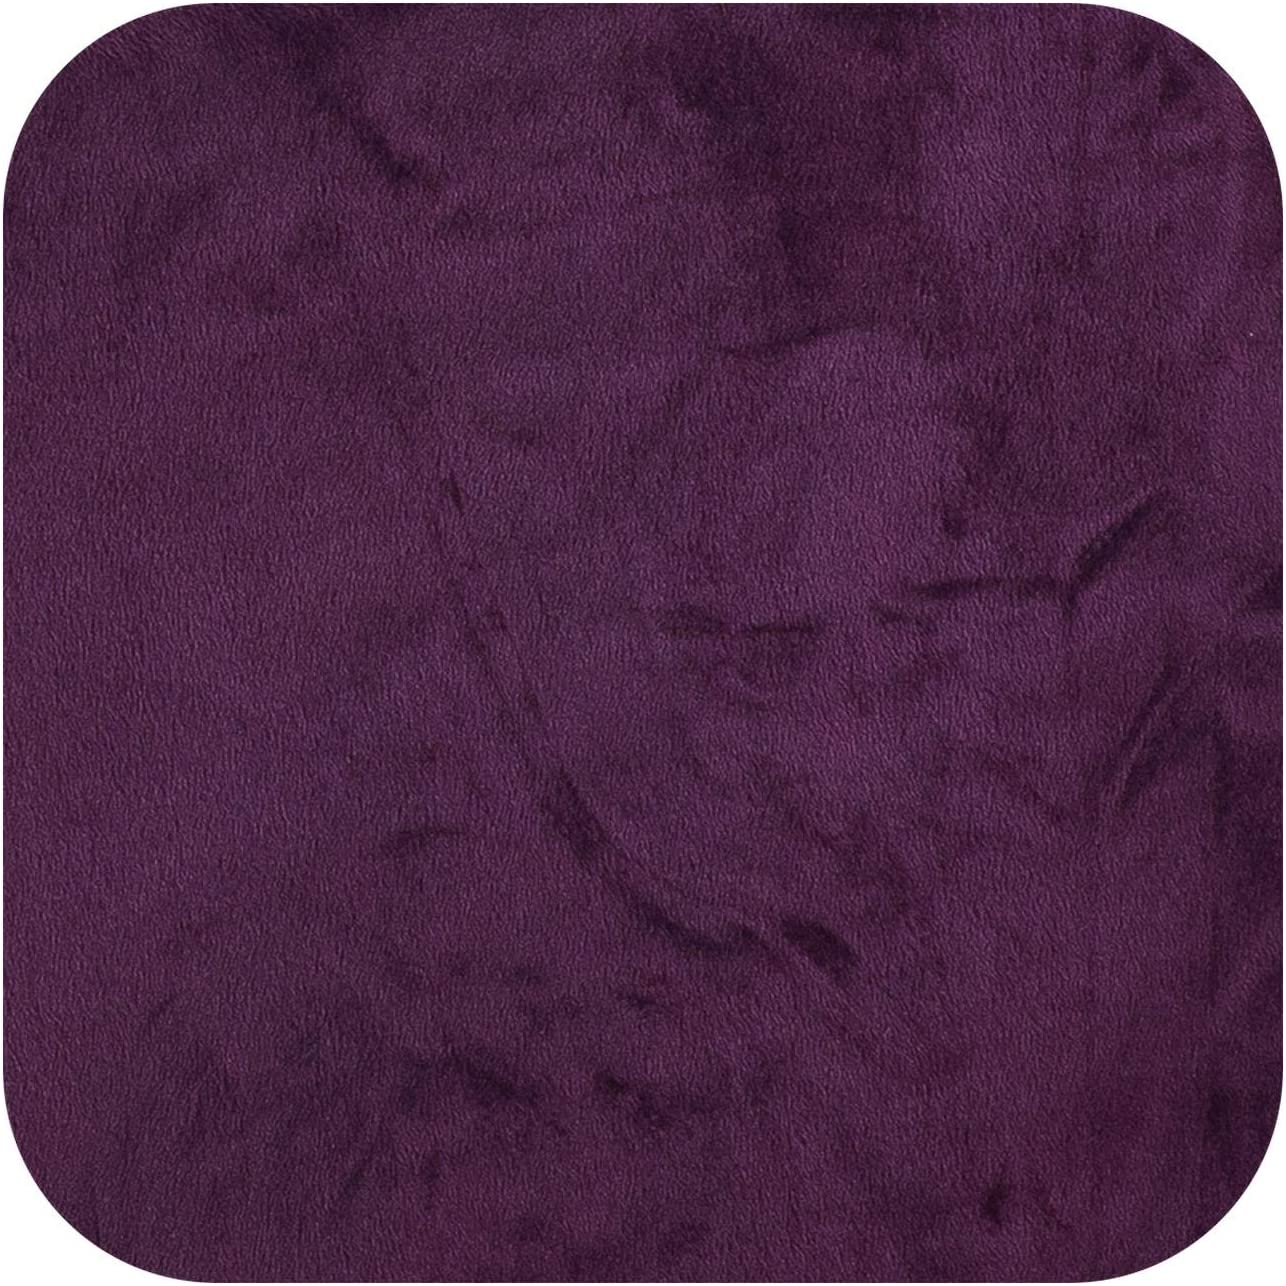 Brand Cheap Sale Venue Velvet Plush L Shaped Sofa Cover Room Living Elastic for Furnitu Elegant